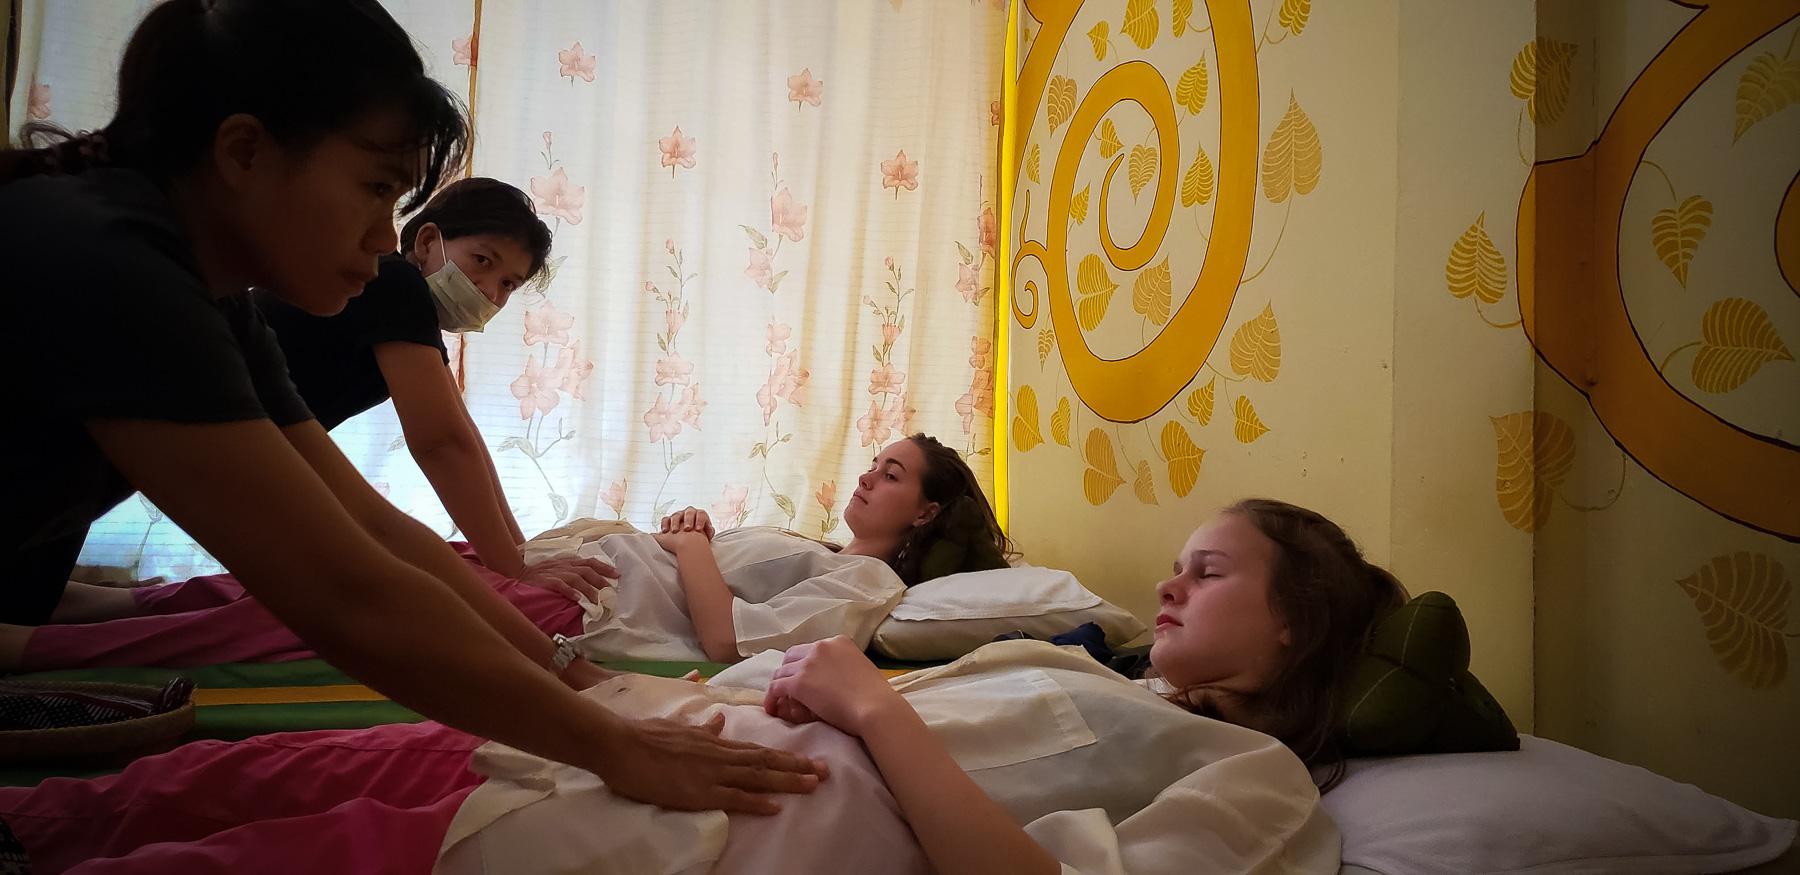 08-massages-2.jpg